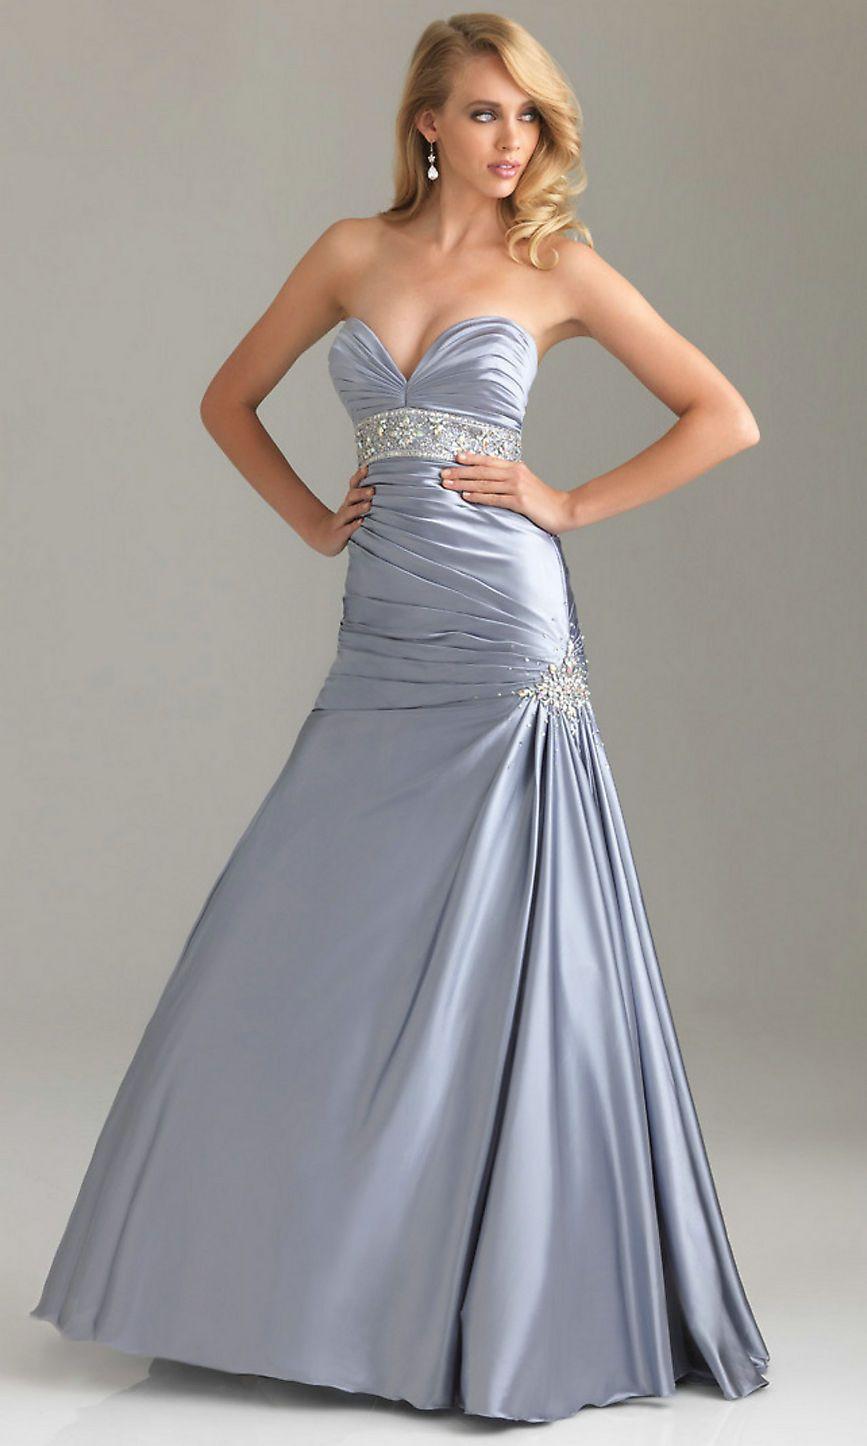 Prom dress silver uk